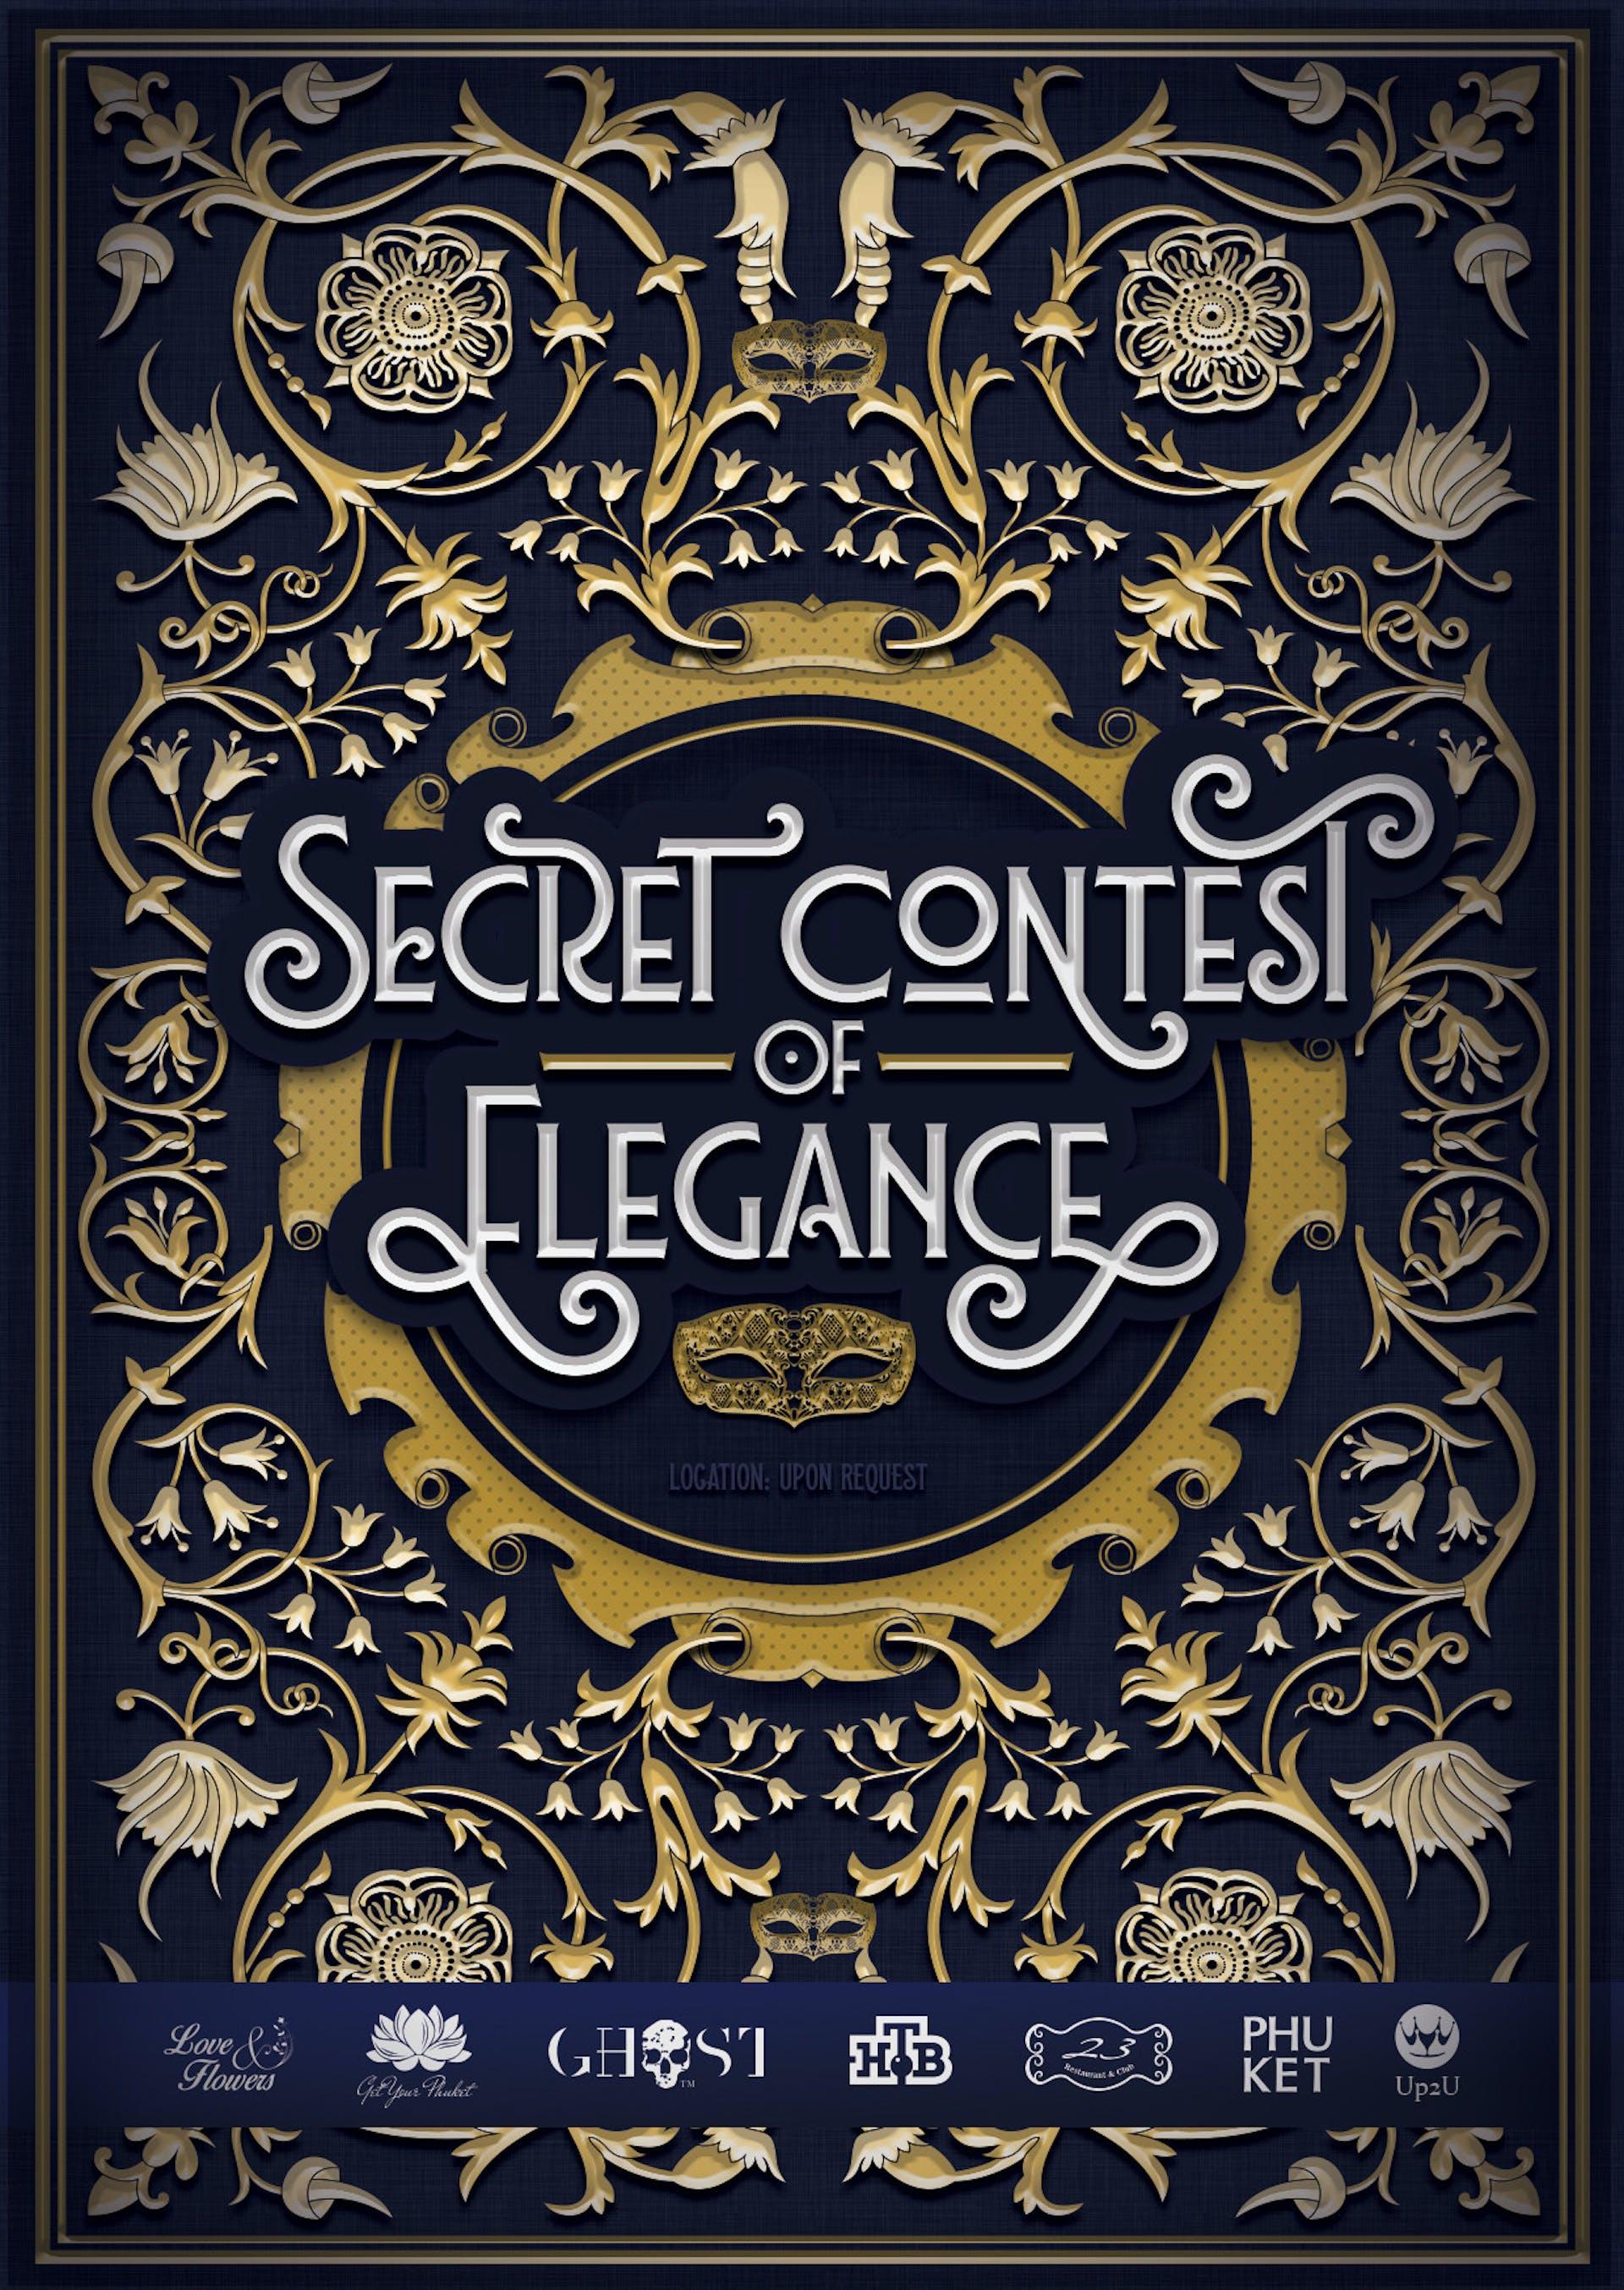 Secret Contest